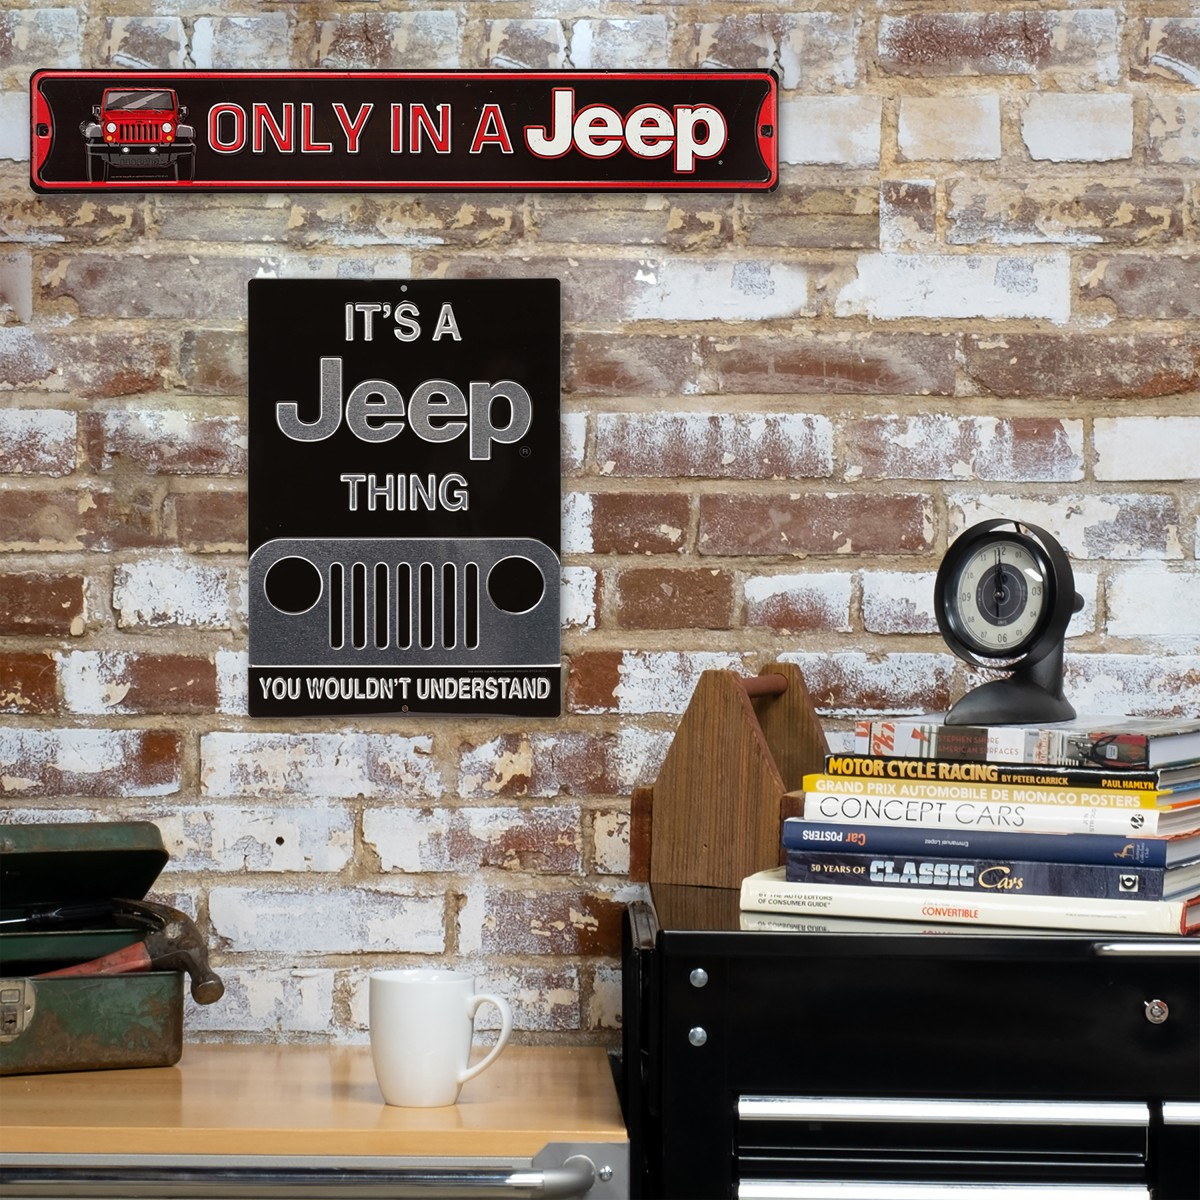 2021 Jeep most patriotic US brand 10